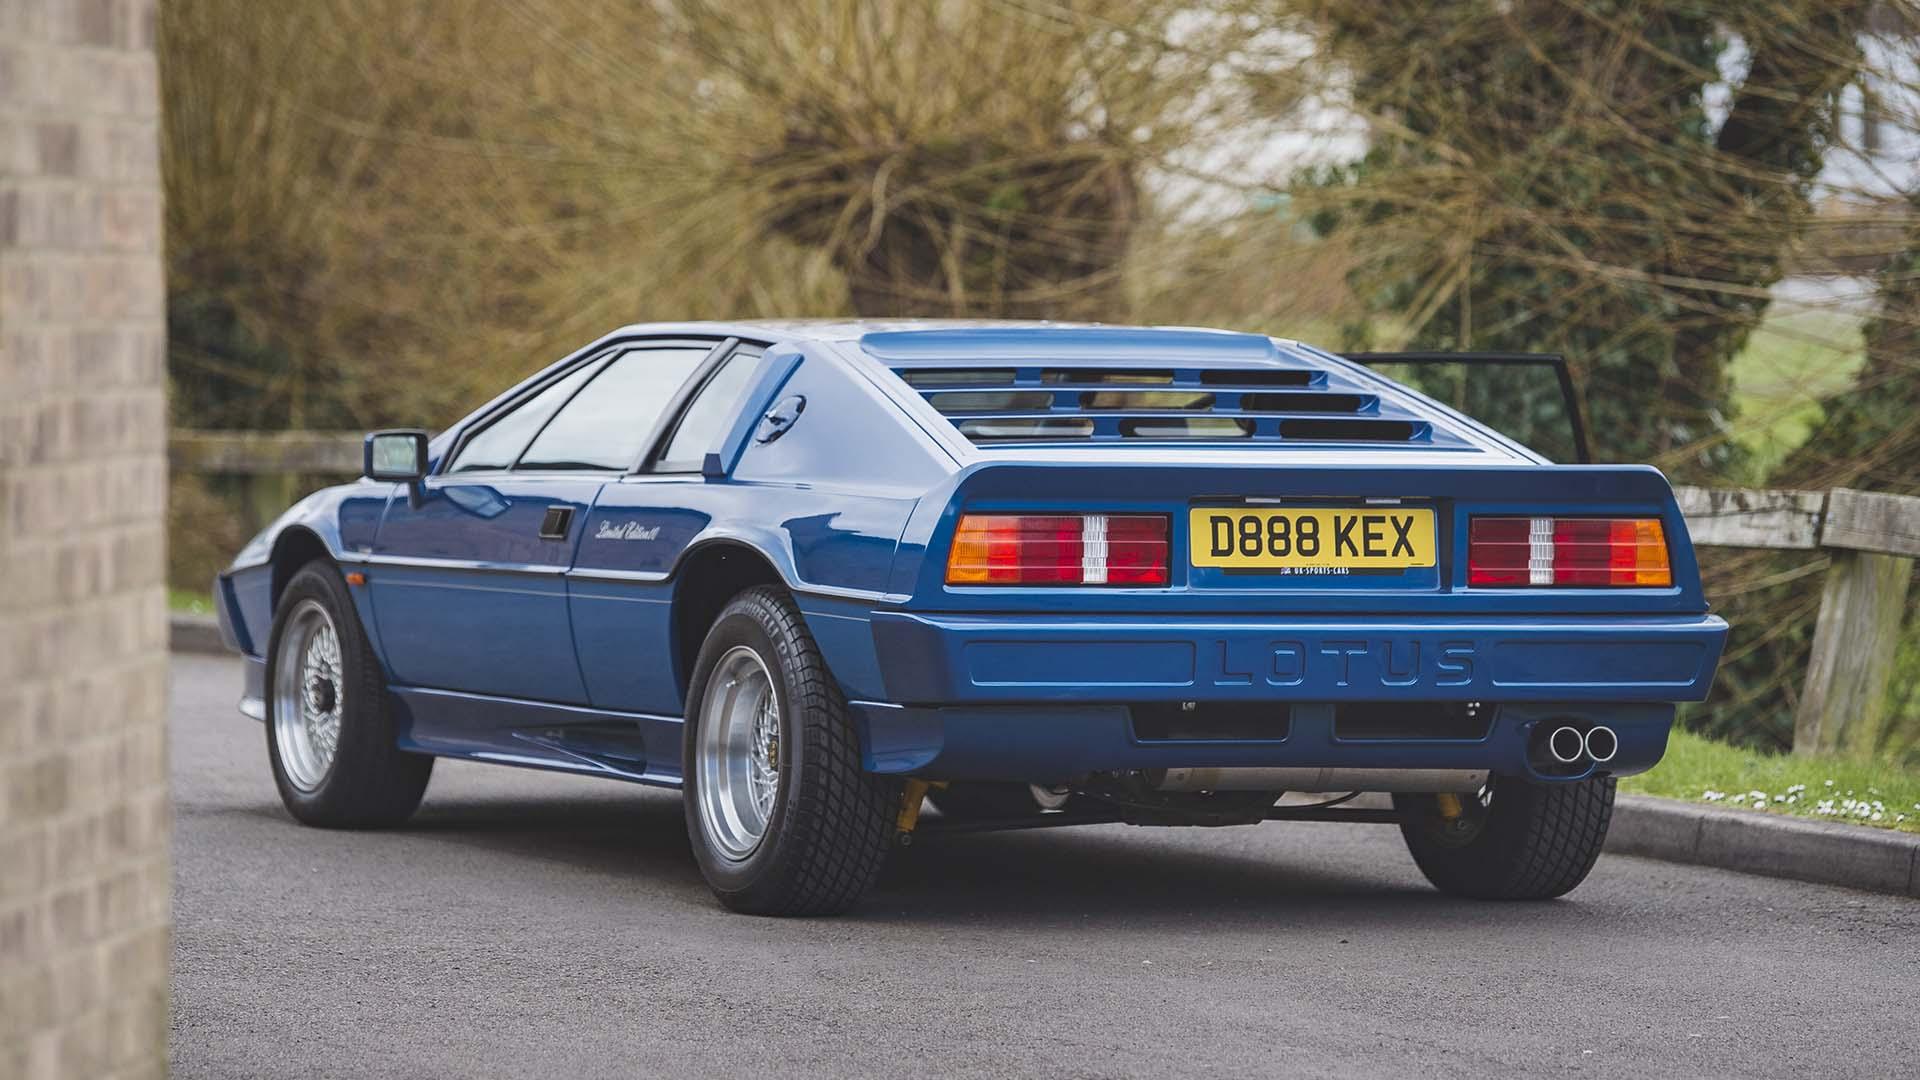 1987 LOTUS Esprit Turbo HC rear angle